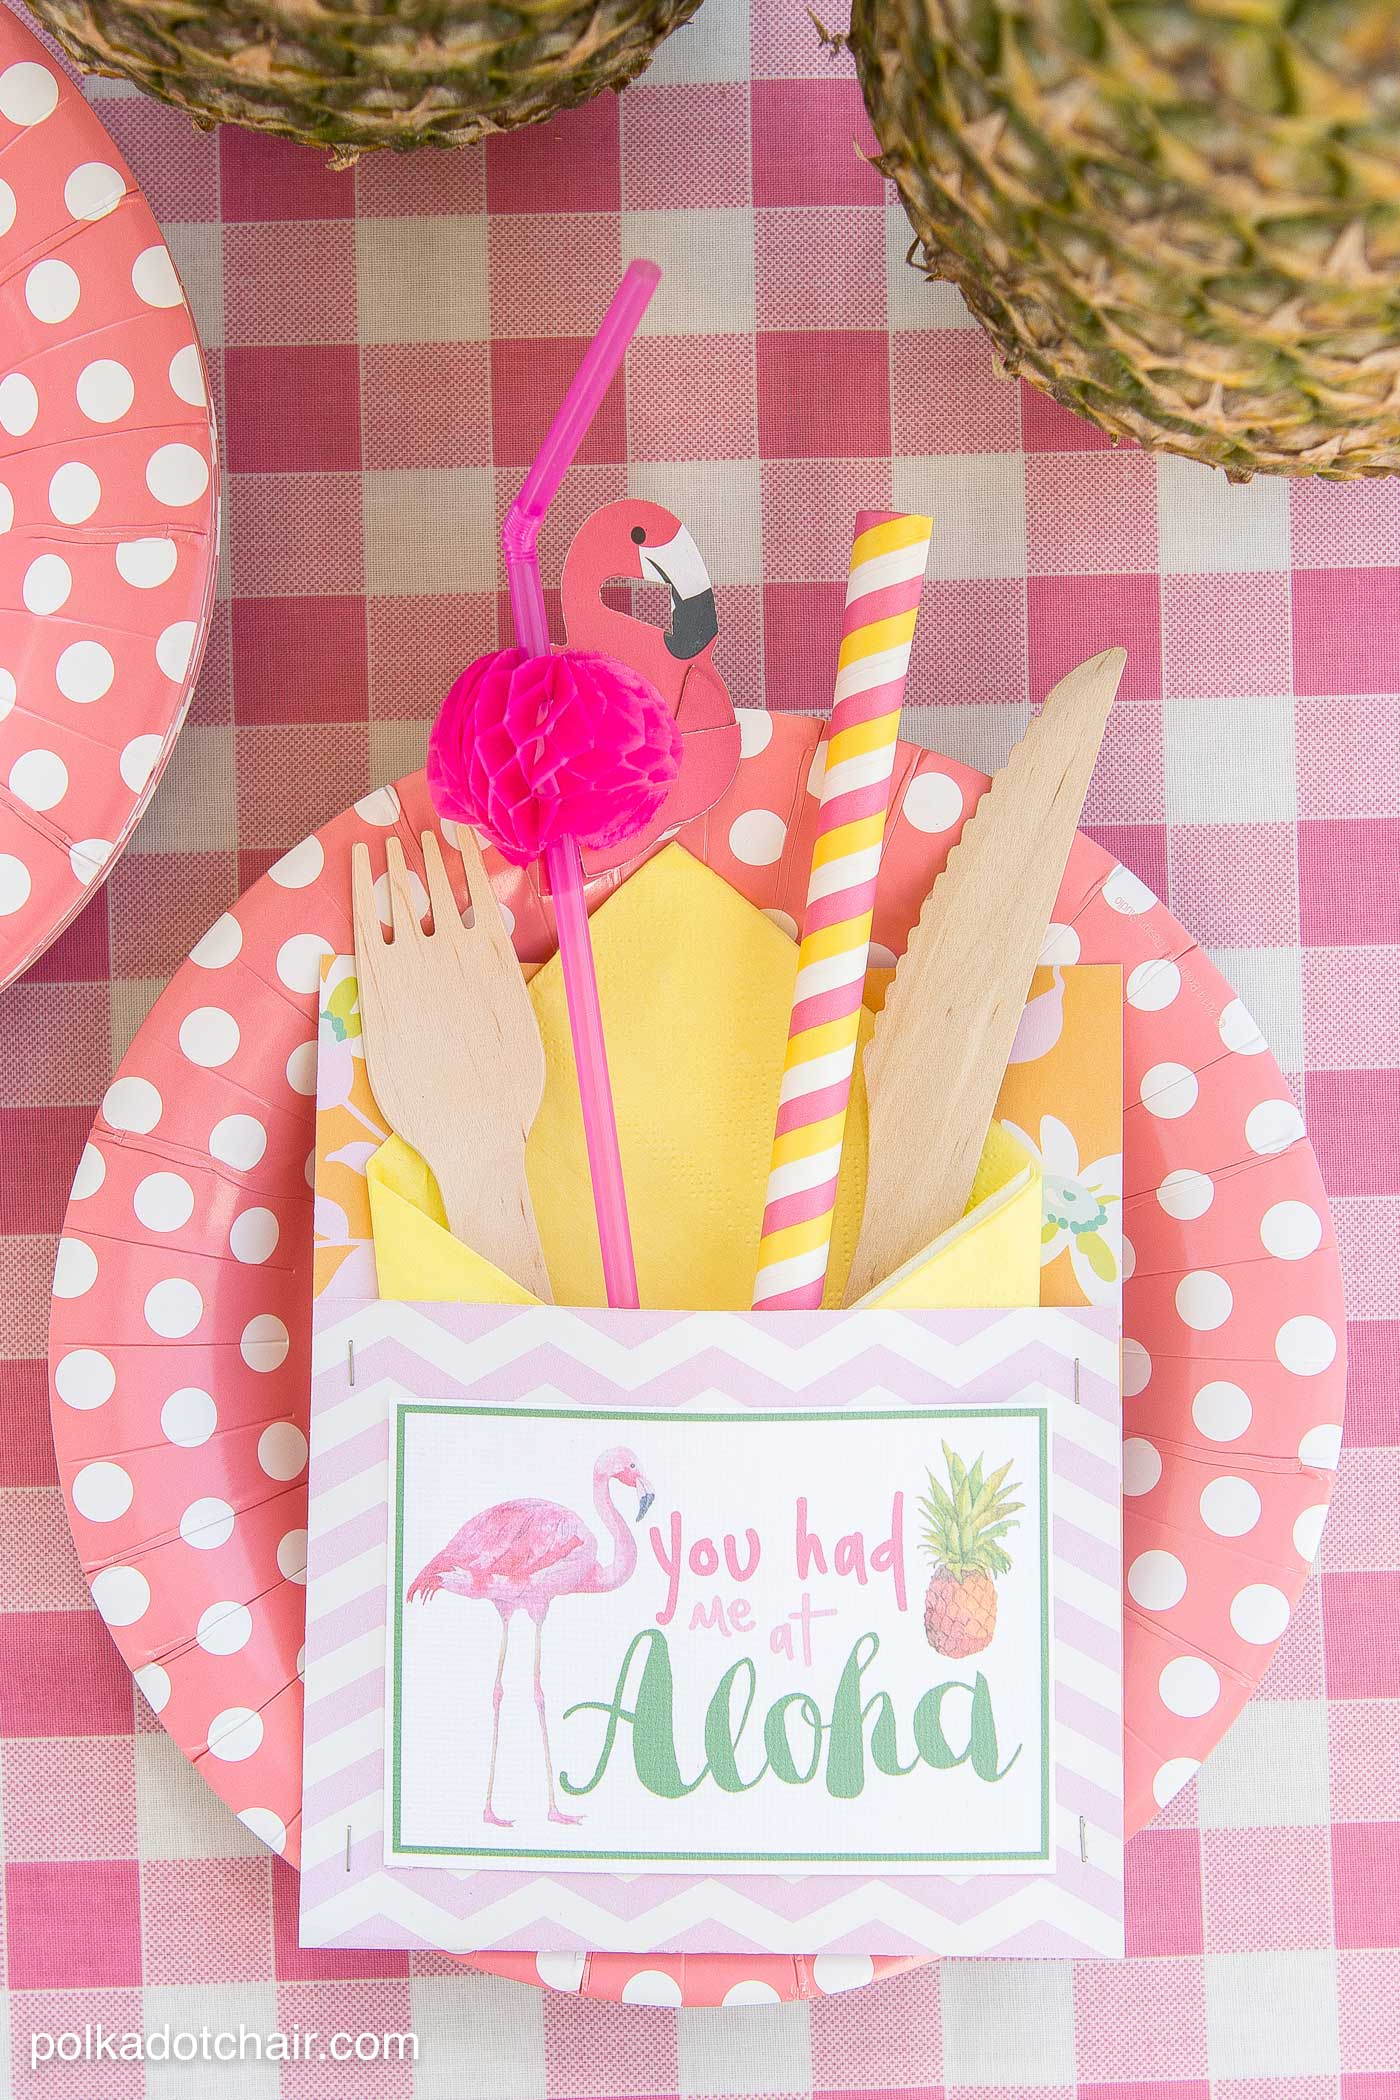 Summer Fun >> Summer Backyard Flamingo Pool Party Ideas - The Polka Dot Chair